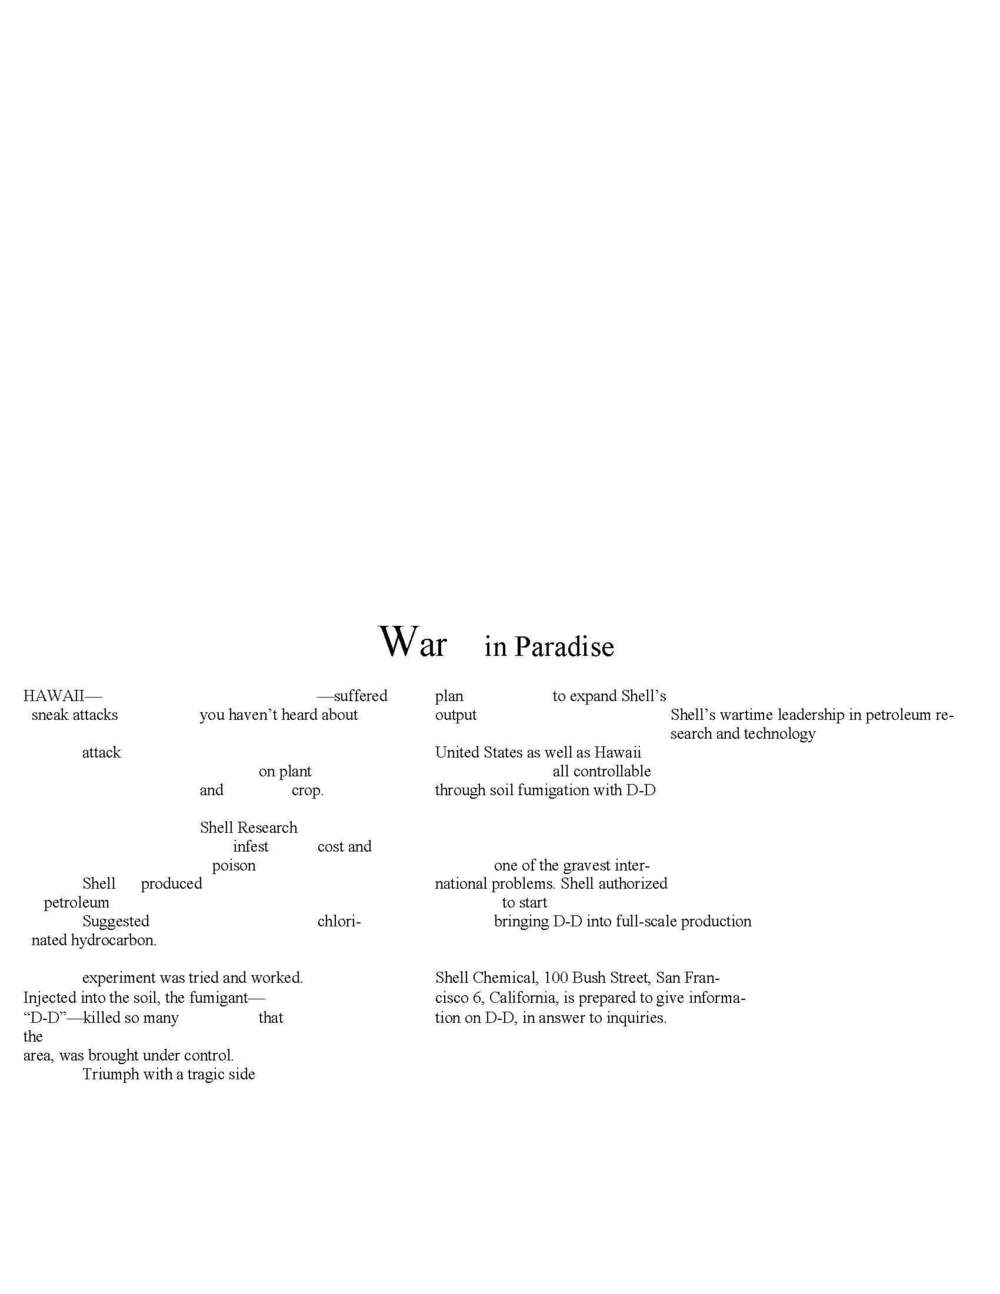 WarinParadise_text_Page_1.jpg